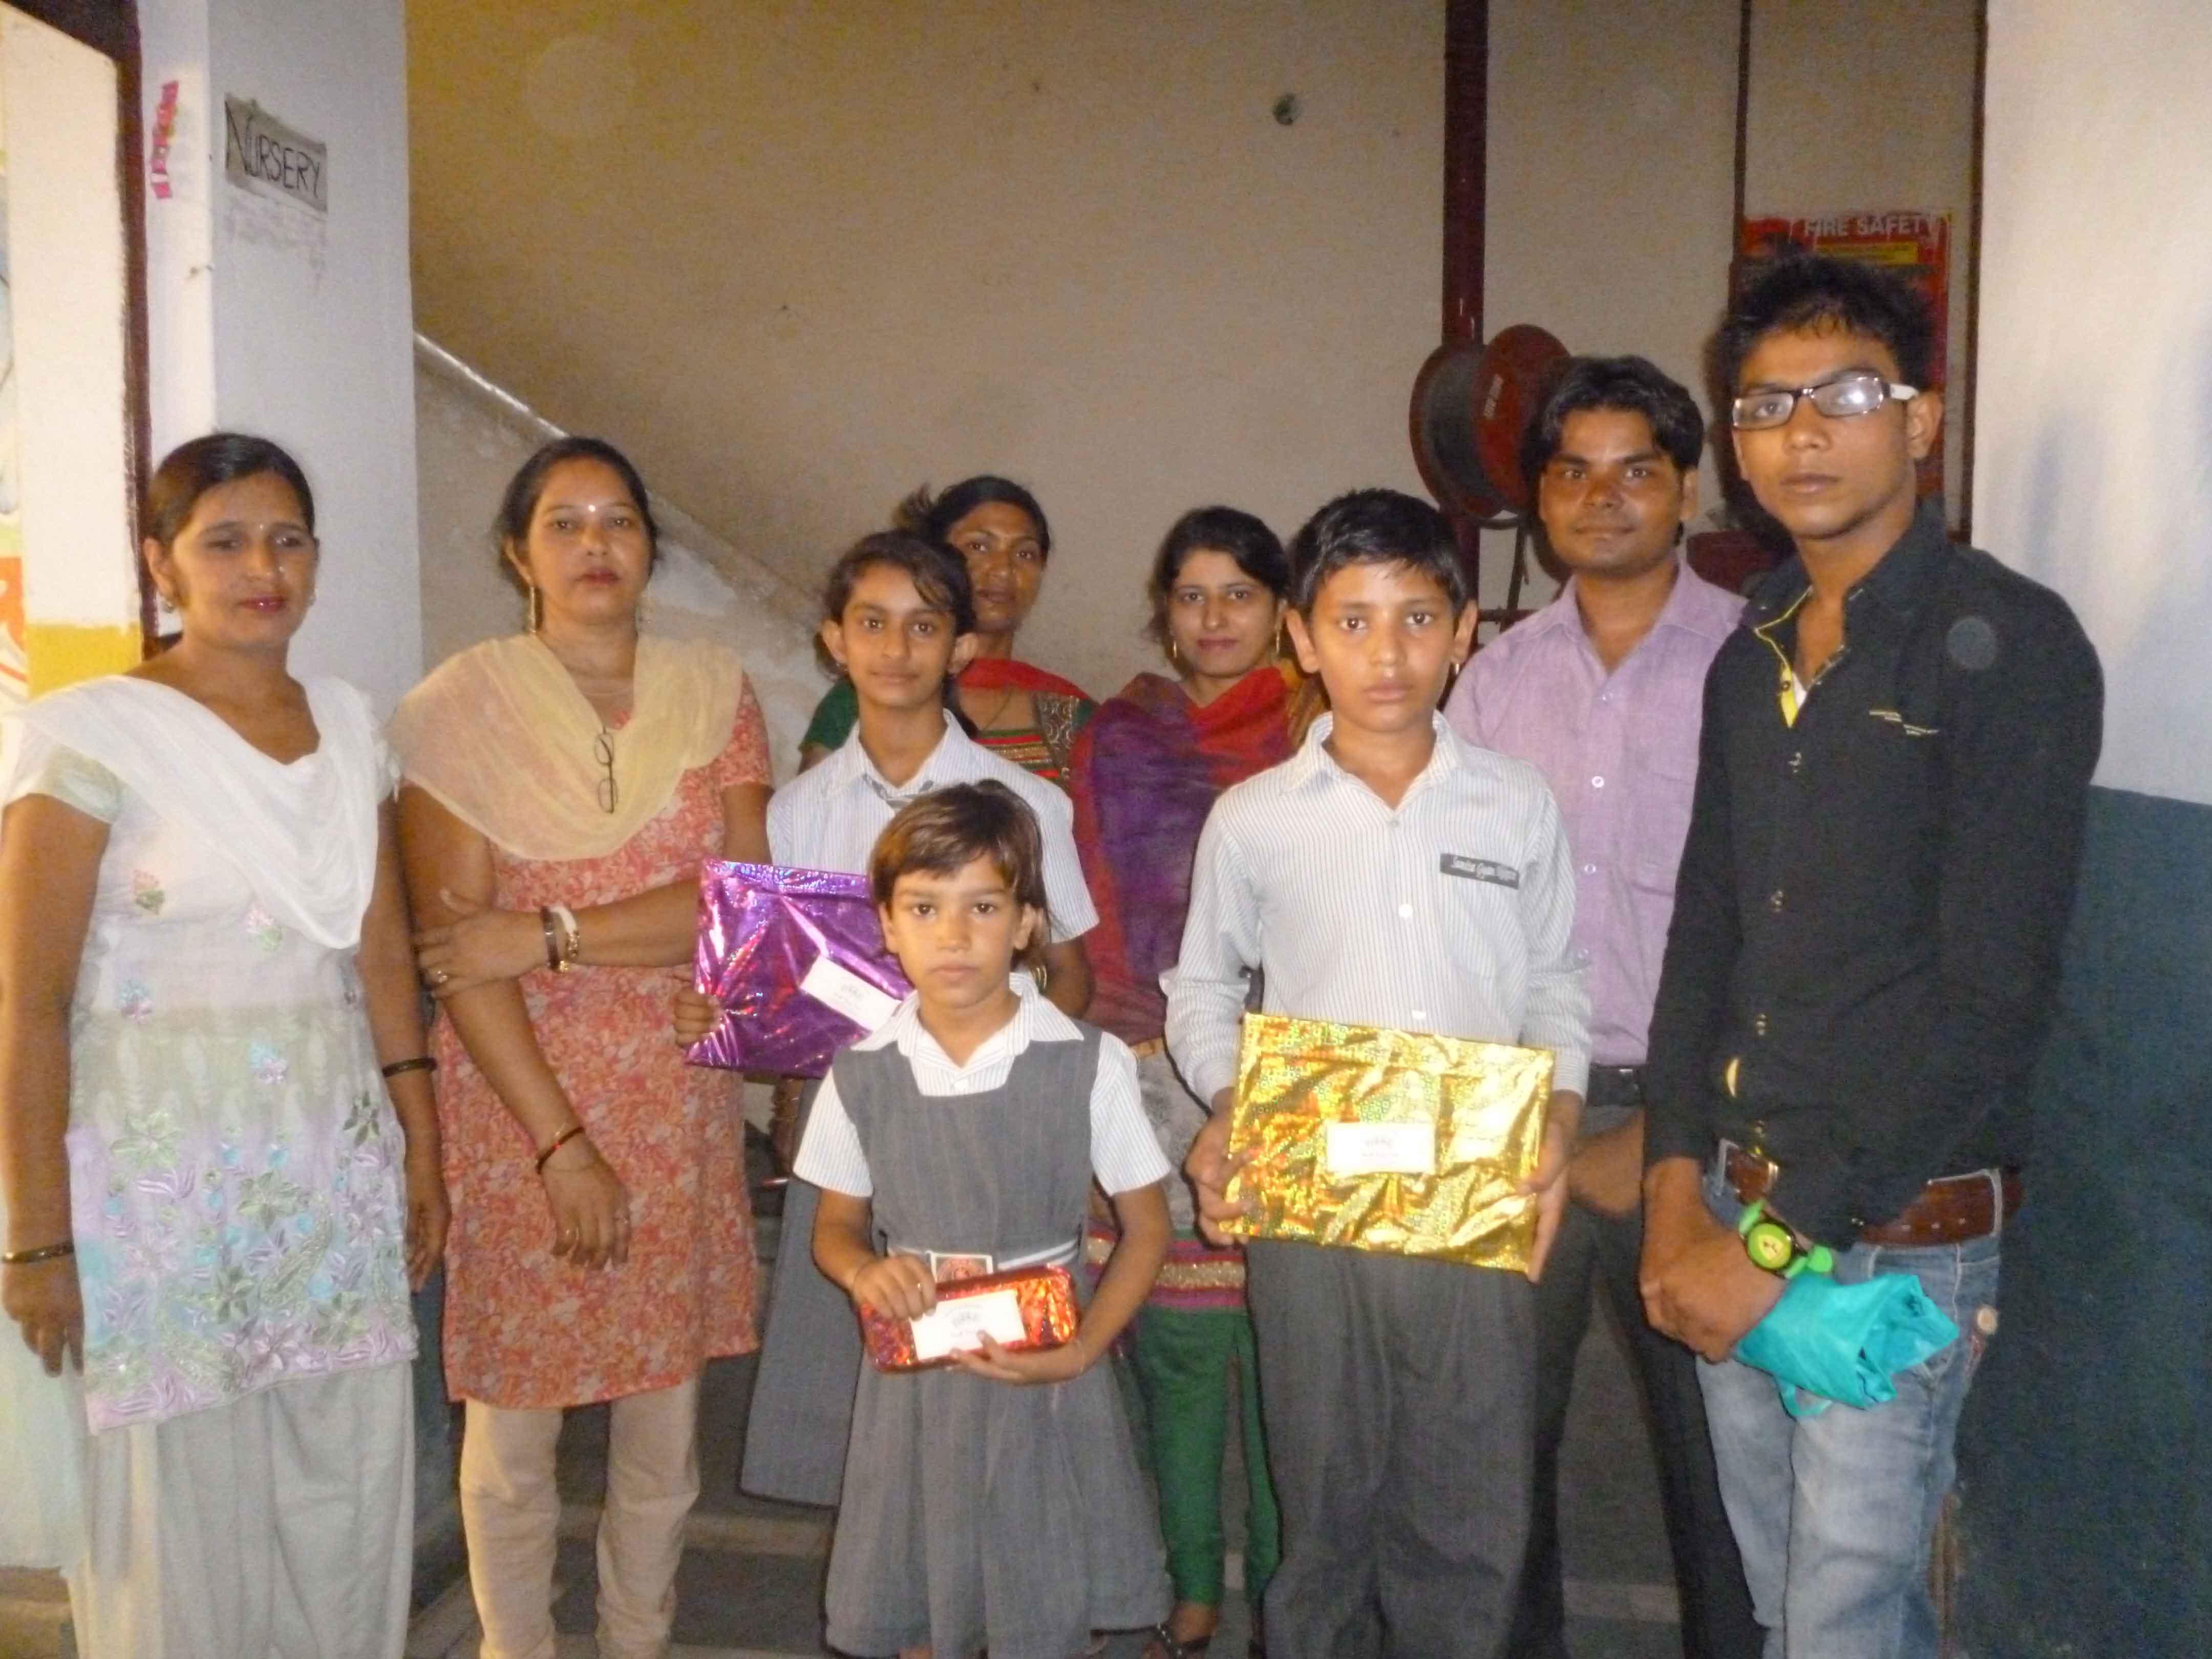 Sunita Gyan Niketan Public School, Chhwala, New Delhi